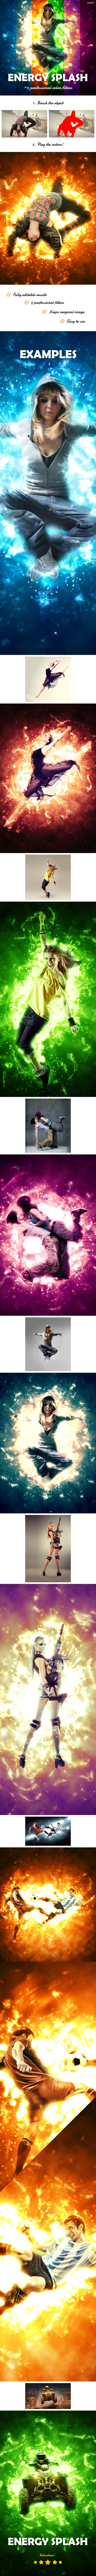 Energy Splash Photoshop Action - Photo Effects Actions